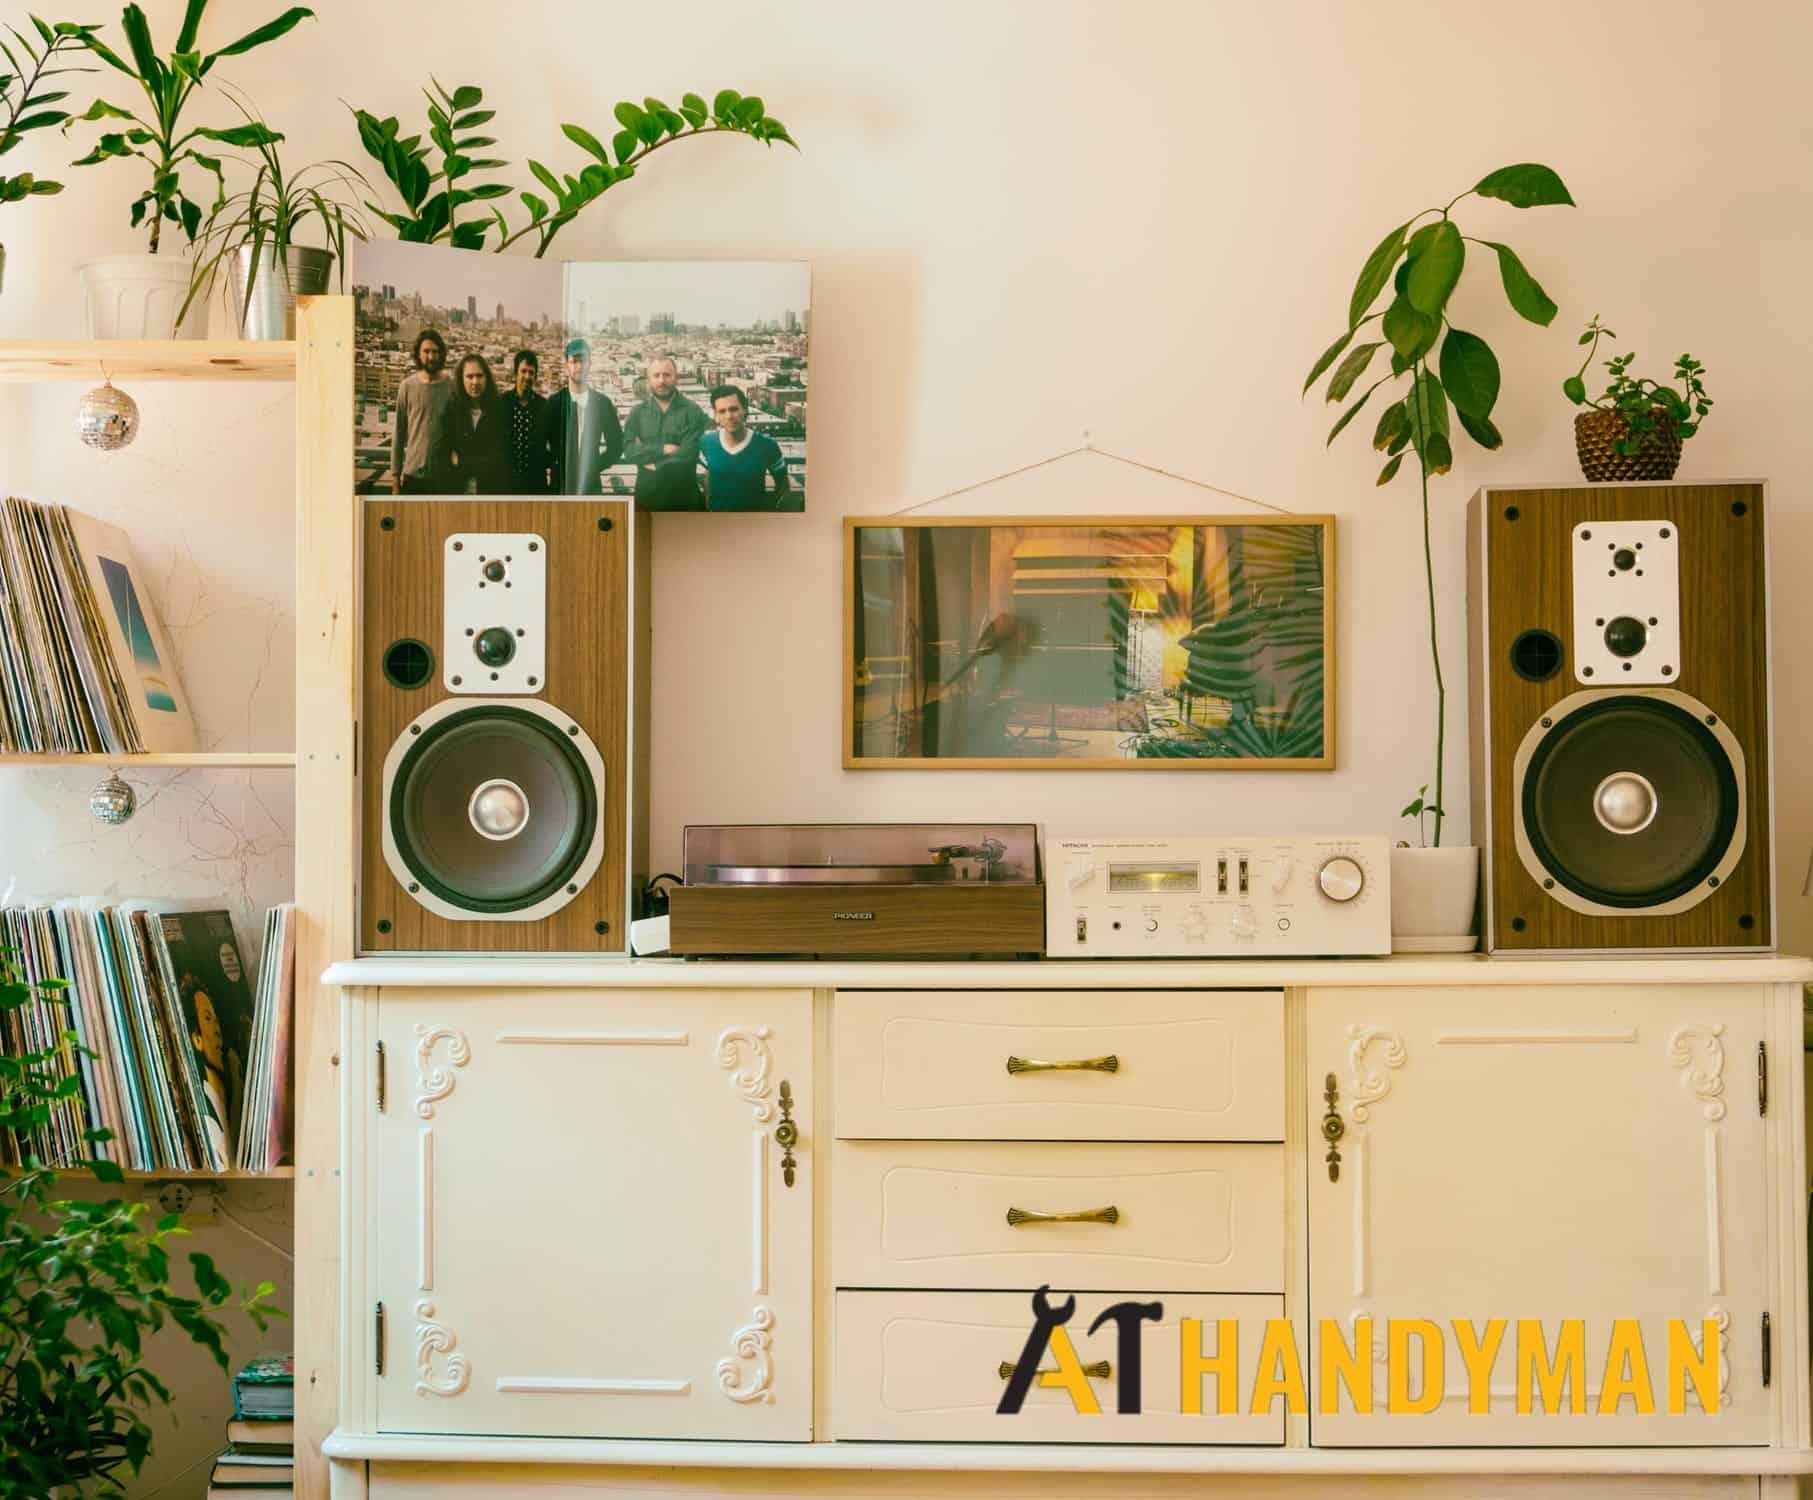 speaker-mount-wall-mount-installation-service-a1-handyman-singapore